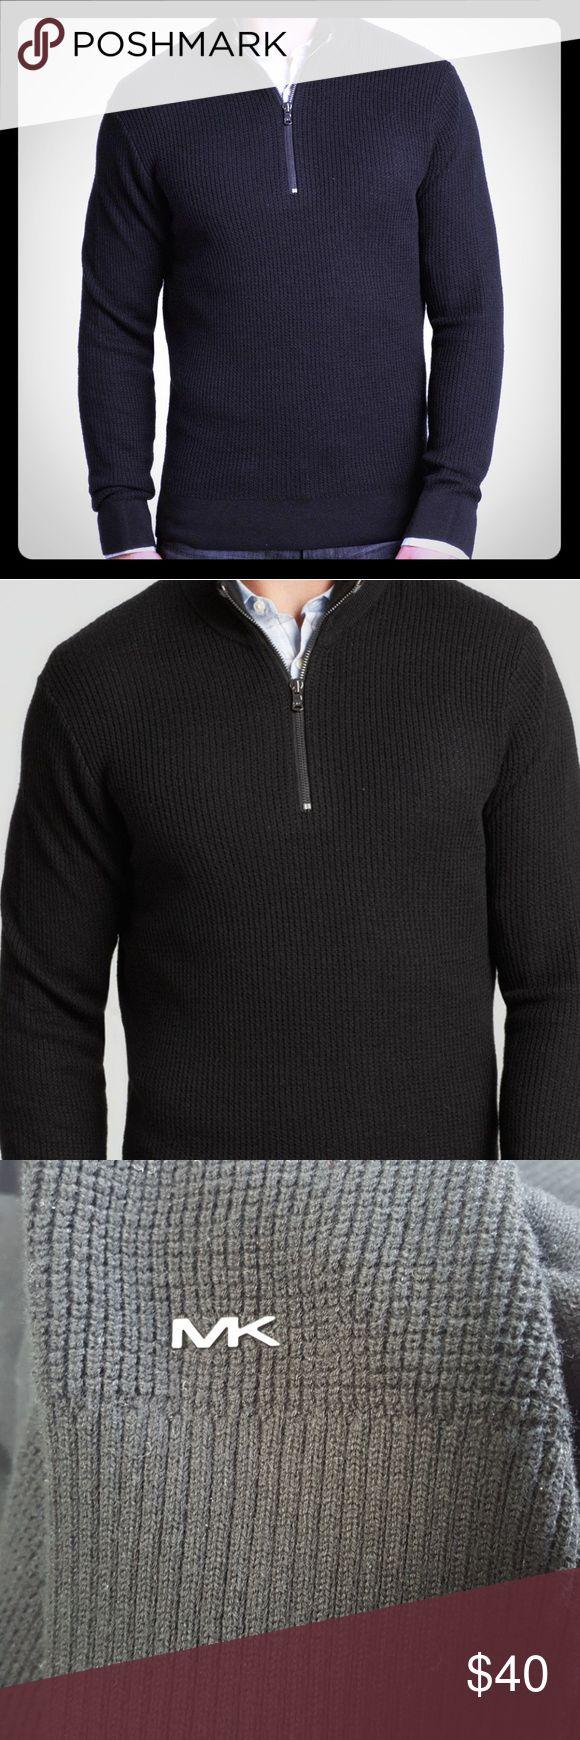 Michael Kors Half Zip Sweater {NWT} Michael Kors Half Zip Sweater *luxurious, classic style *100% cotton *MK logo at bottom front *Retails $99  *Men's size L  *NWT** Michael Kors Sweaters